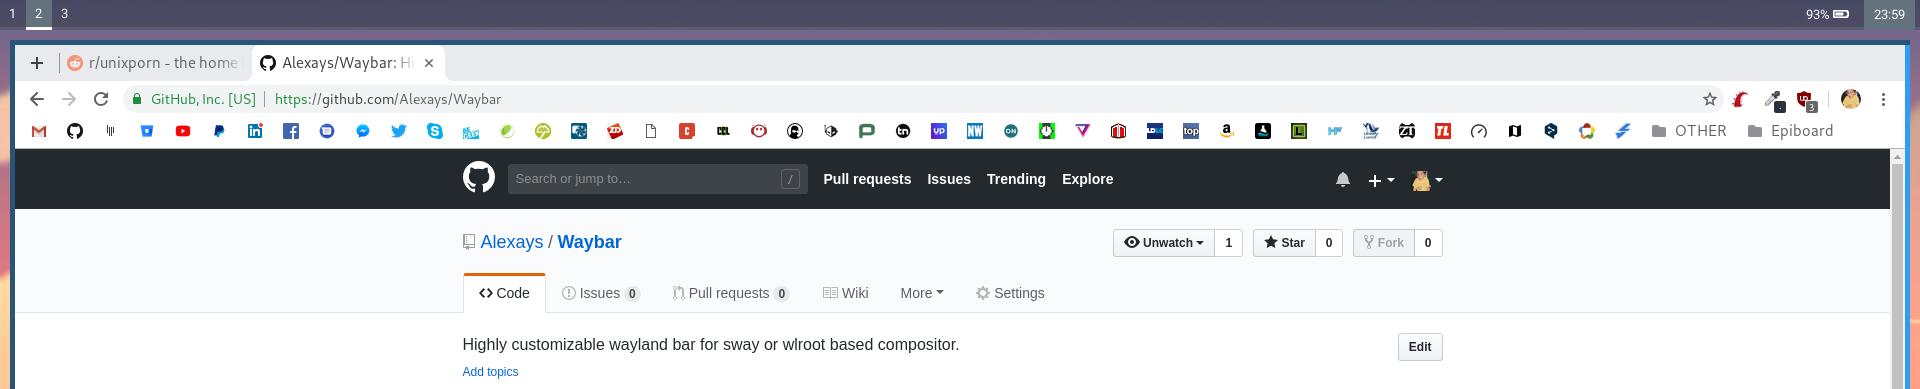 Waybar v0.0.0